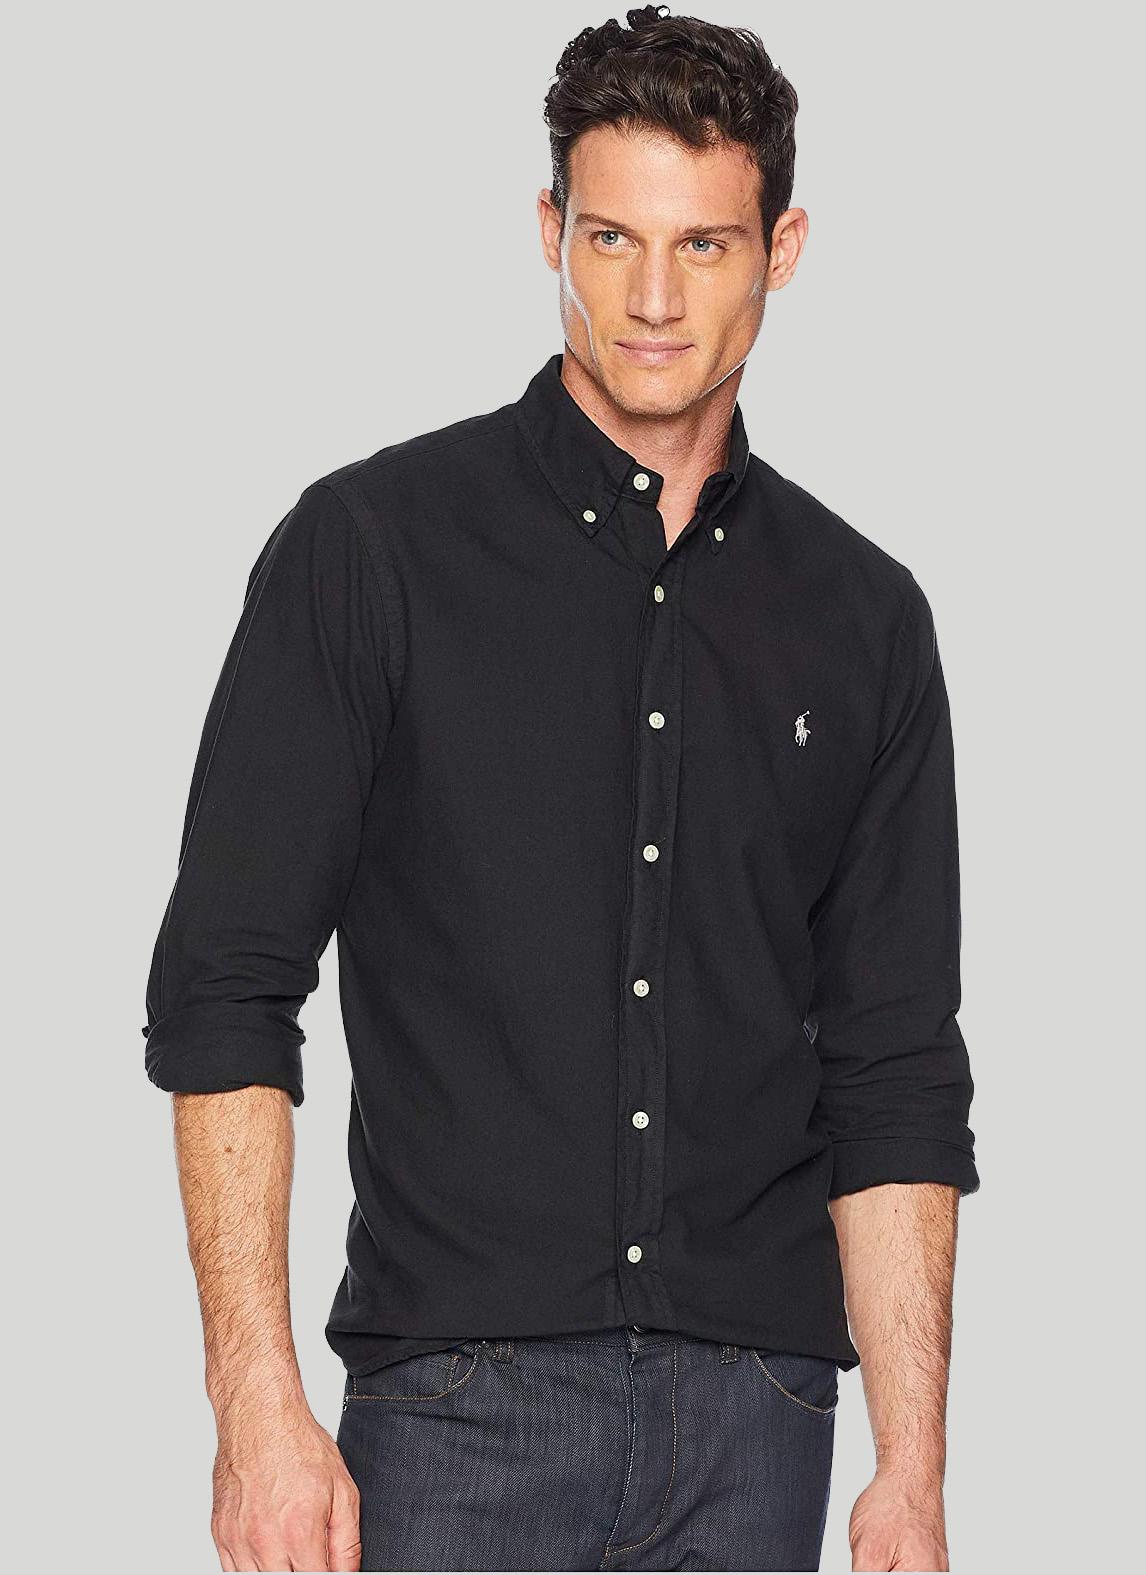 Camisa Ralph Lauren Masculina Custom Fit Gingham Oxford Preto